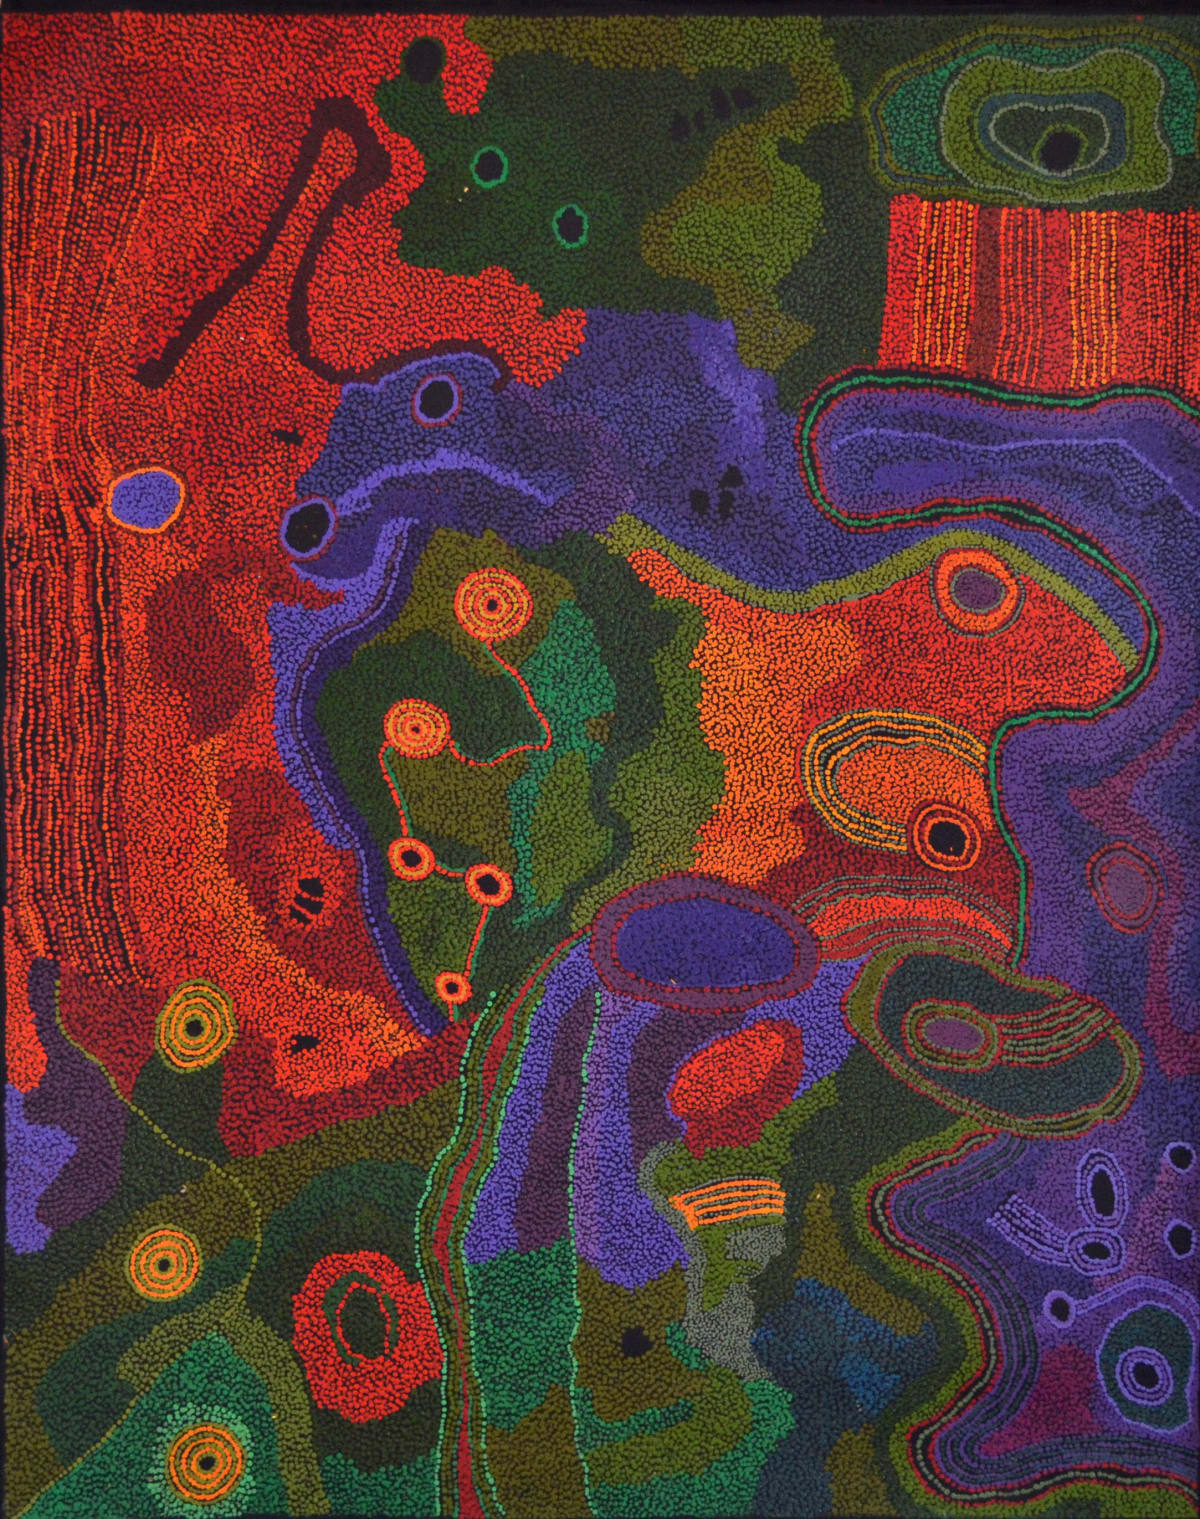 Tjungkara Ken Seven Sisters 2014 acrylic on linen 152.5 x 122 cm